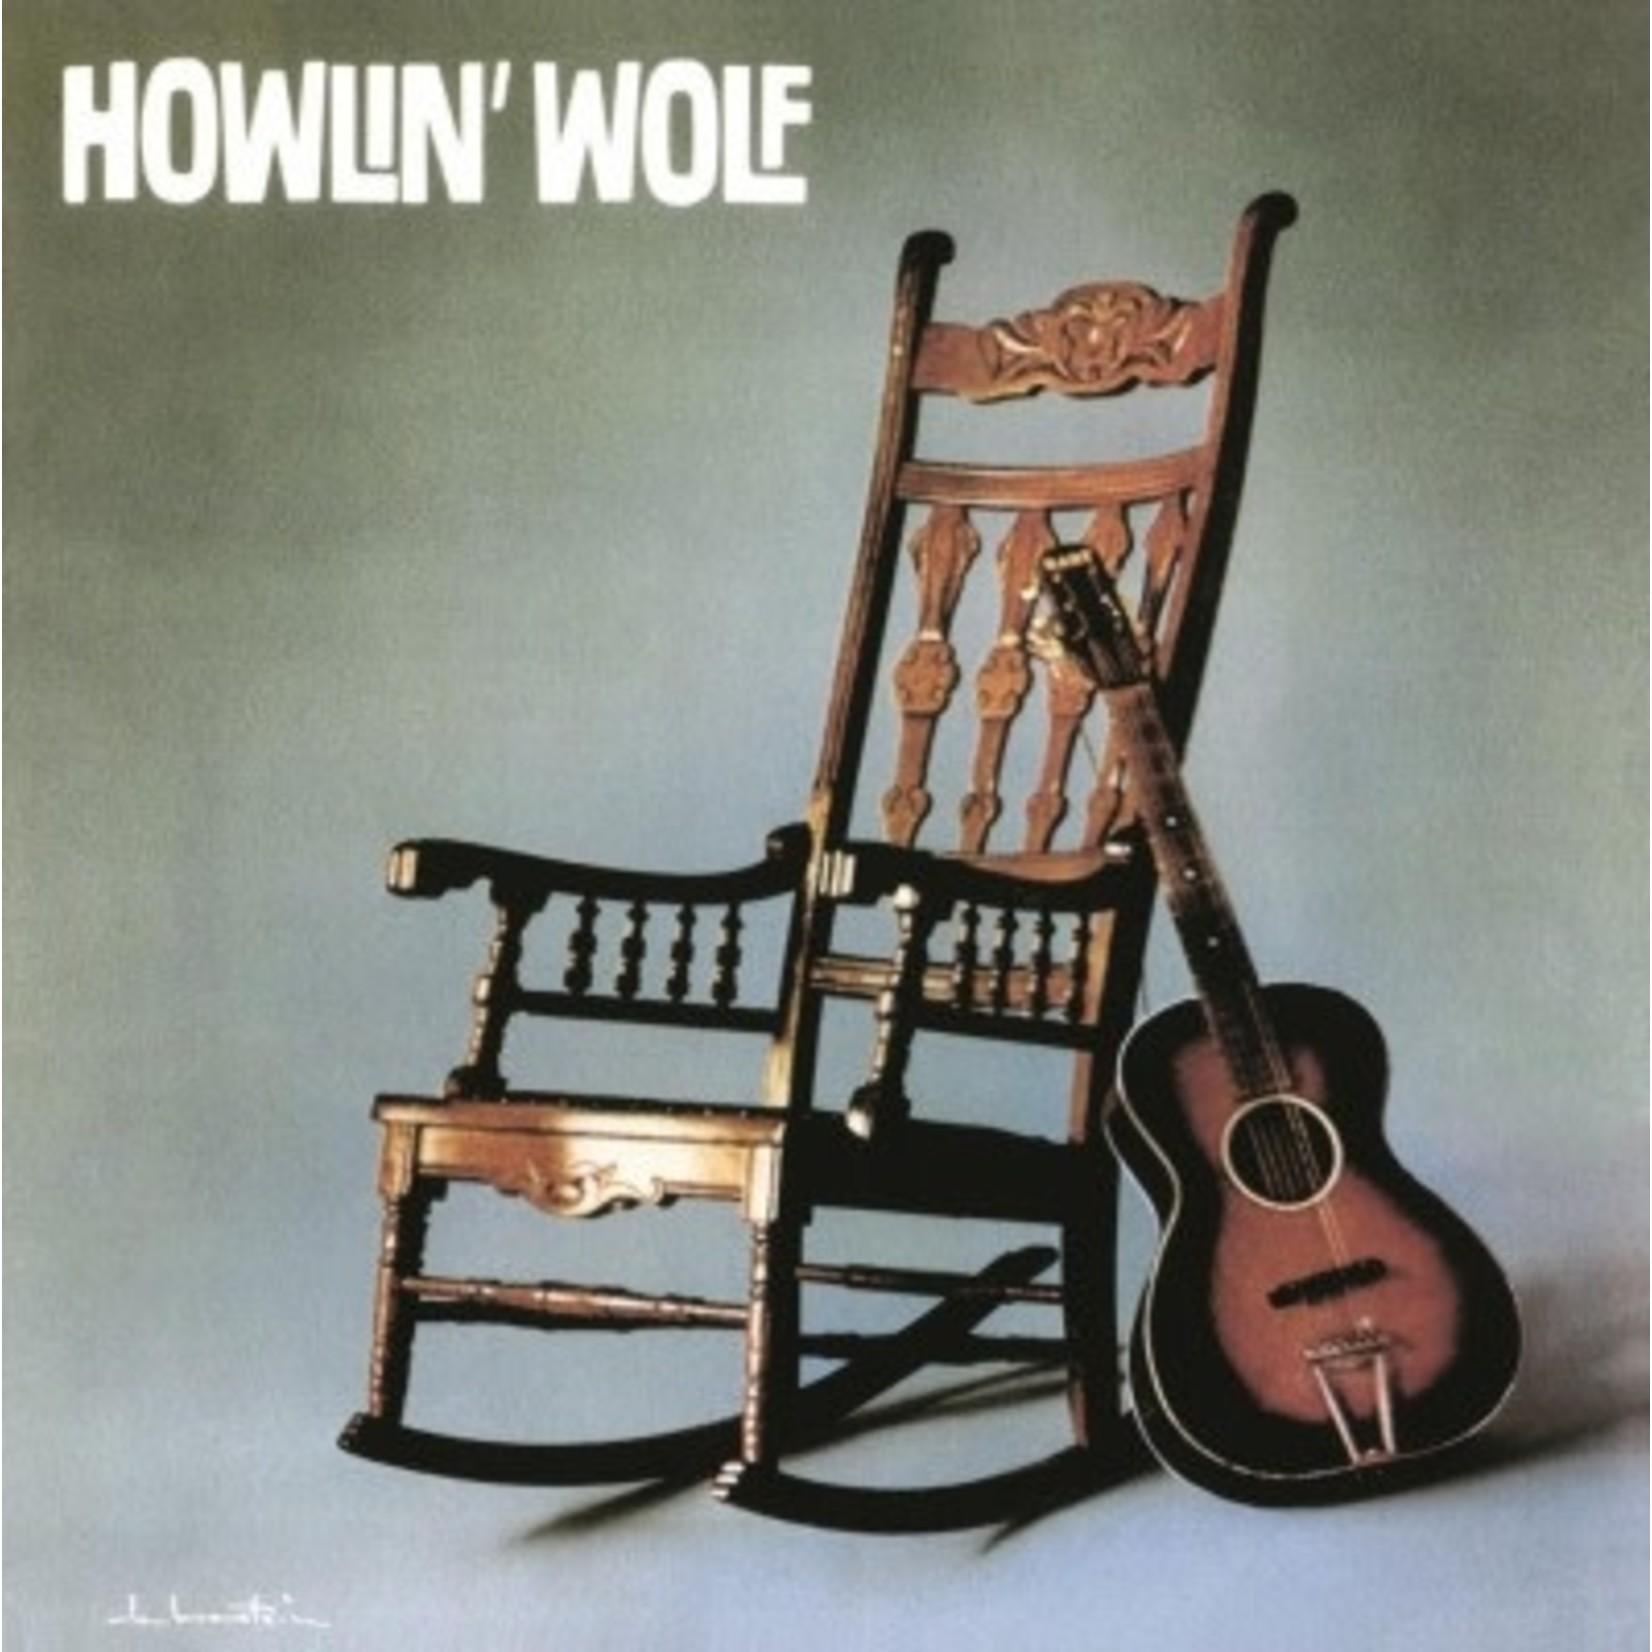 [New] Howlin' Wolf: Rockin' Chair Album